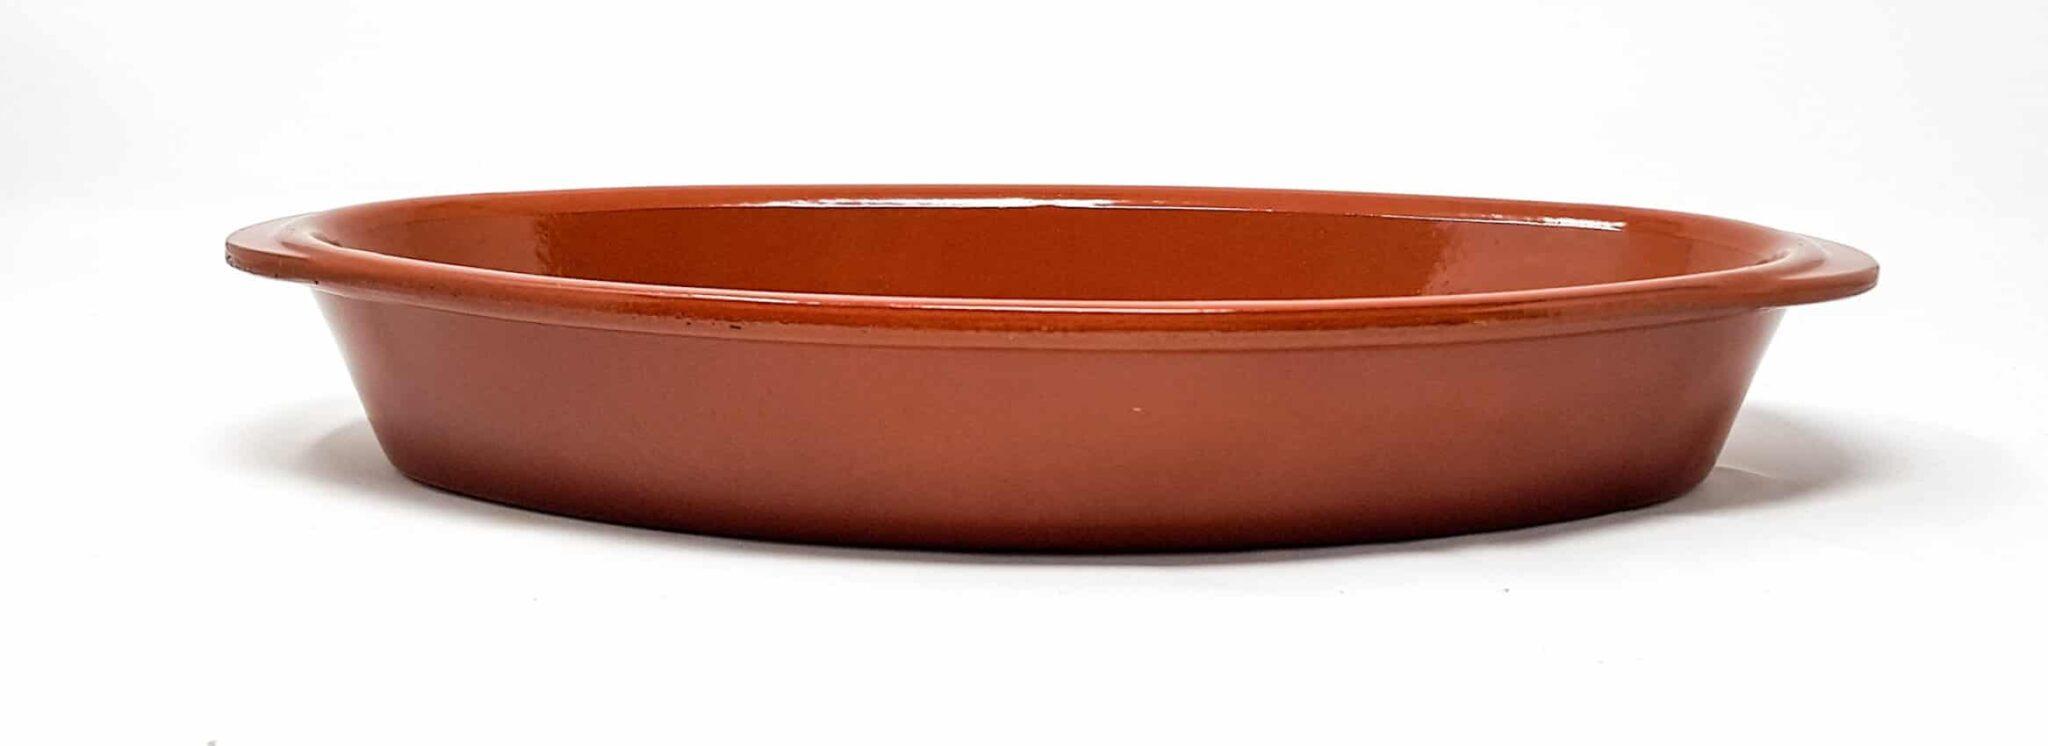 Verano-Spanish-Ceramics-El-Toro-Oval-Dish-3